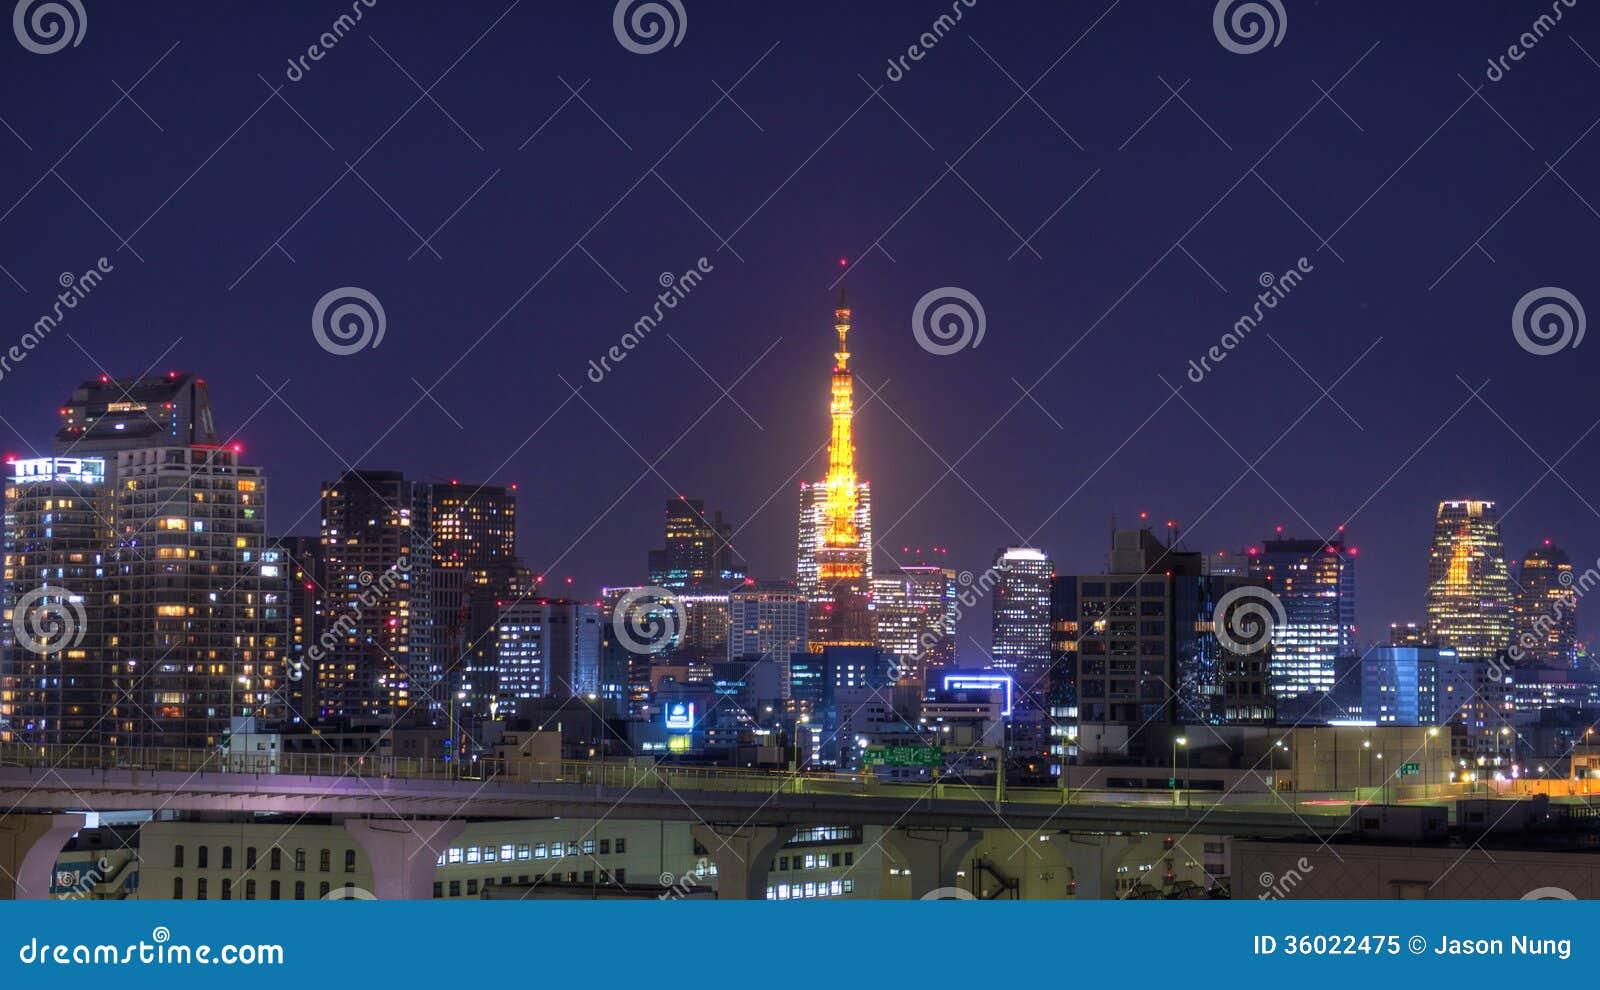 Tokyo Tower Royalty Free Stock Photo - Image: 36022475